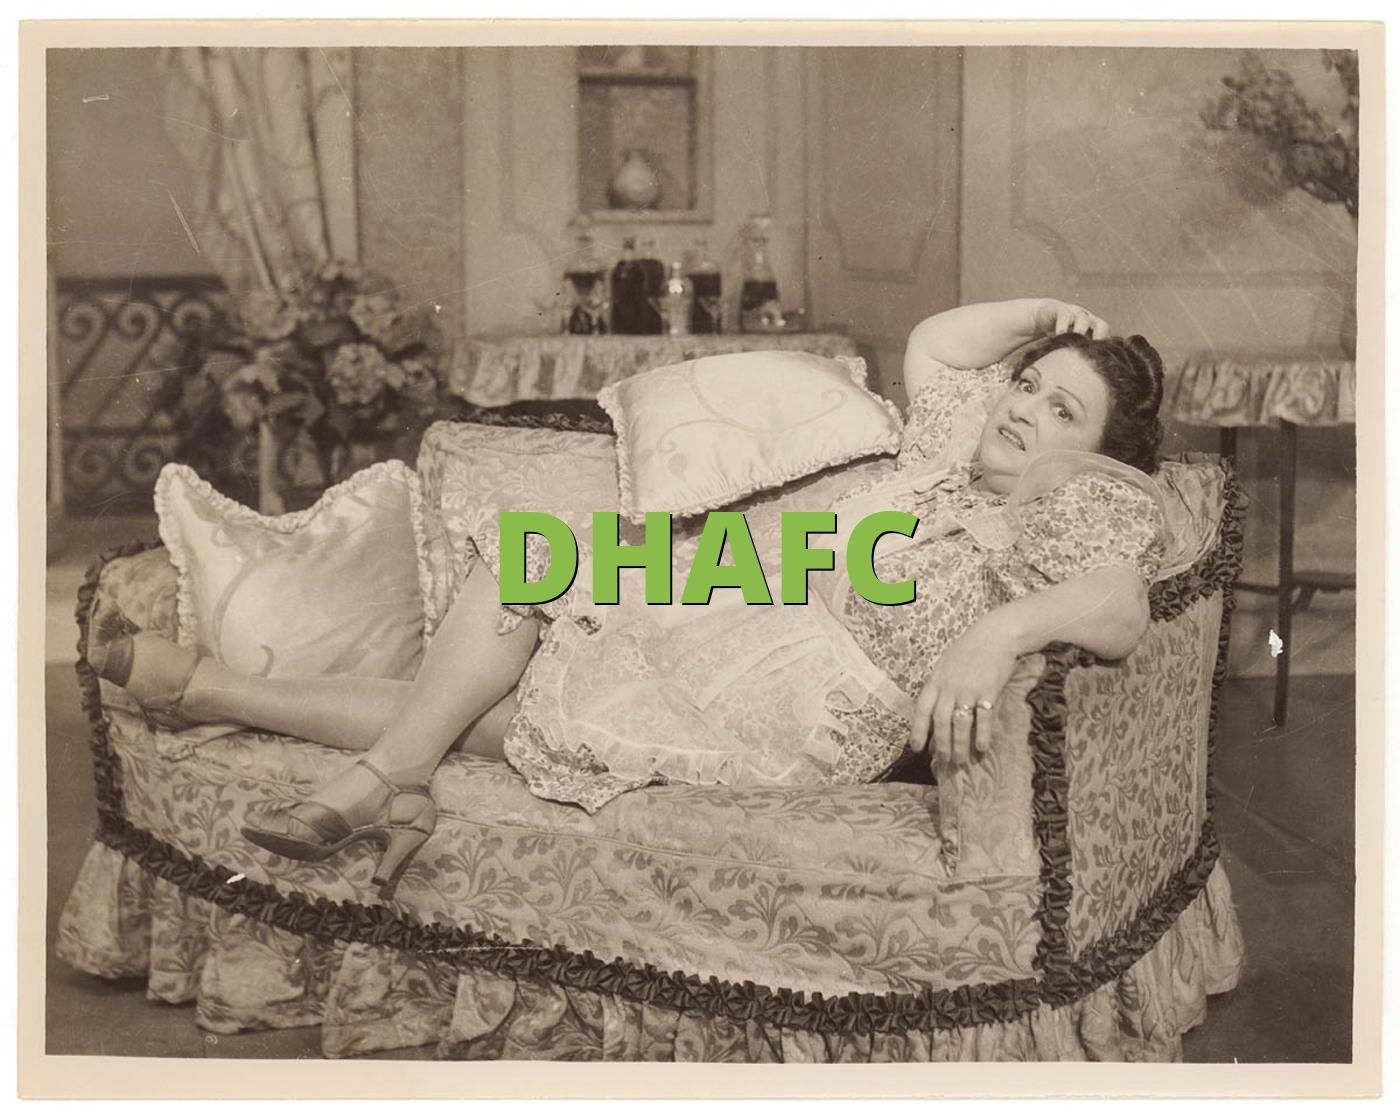 DHAFC